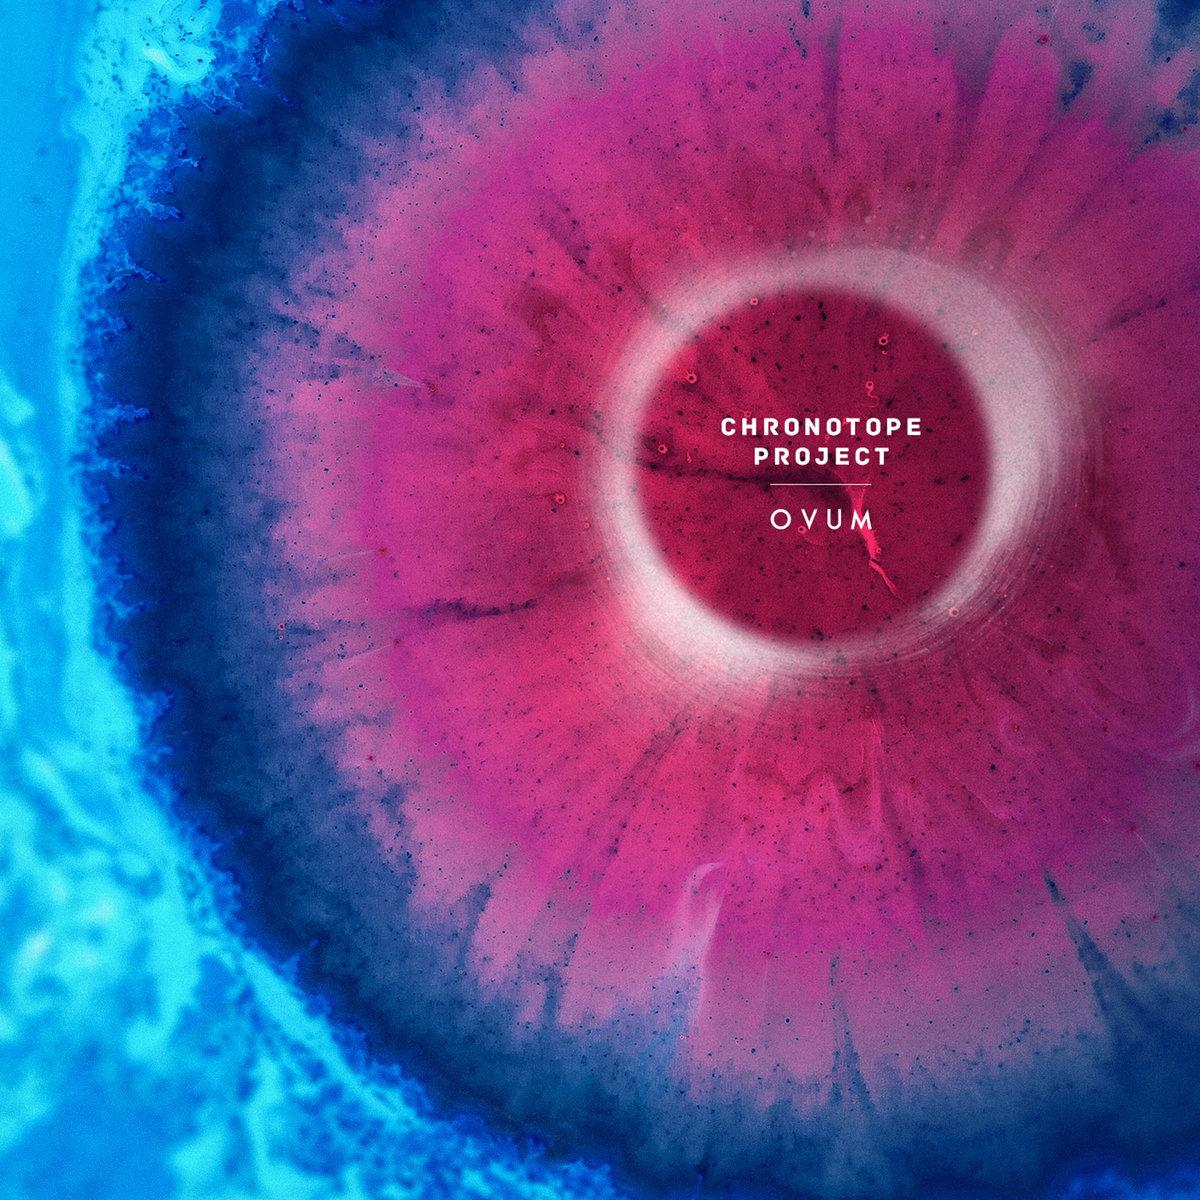 47. Chronotope Project - Ovum